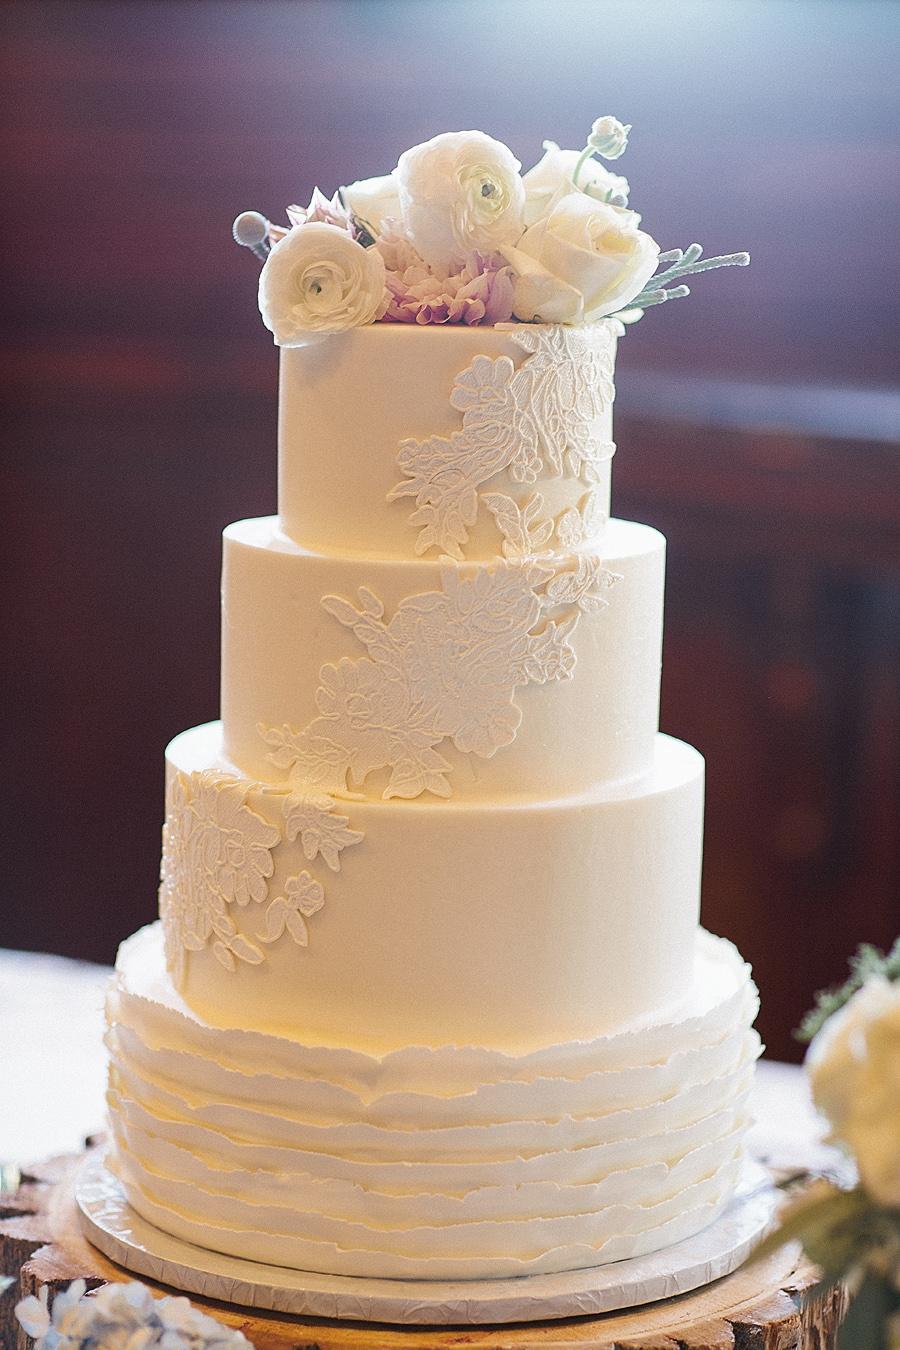 Emily_Todd_LarkspurColorado_Wedding_25.jpg